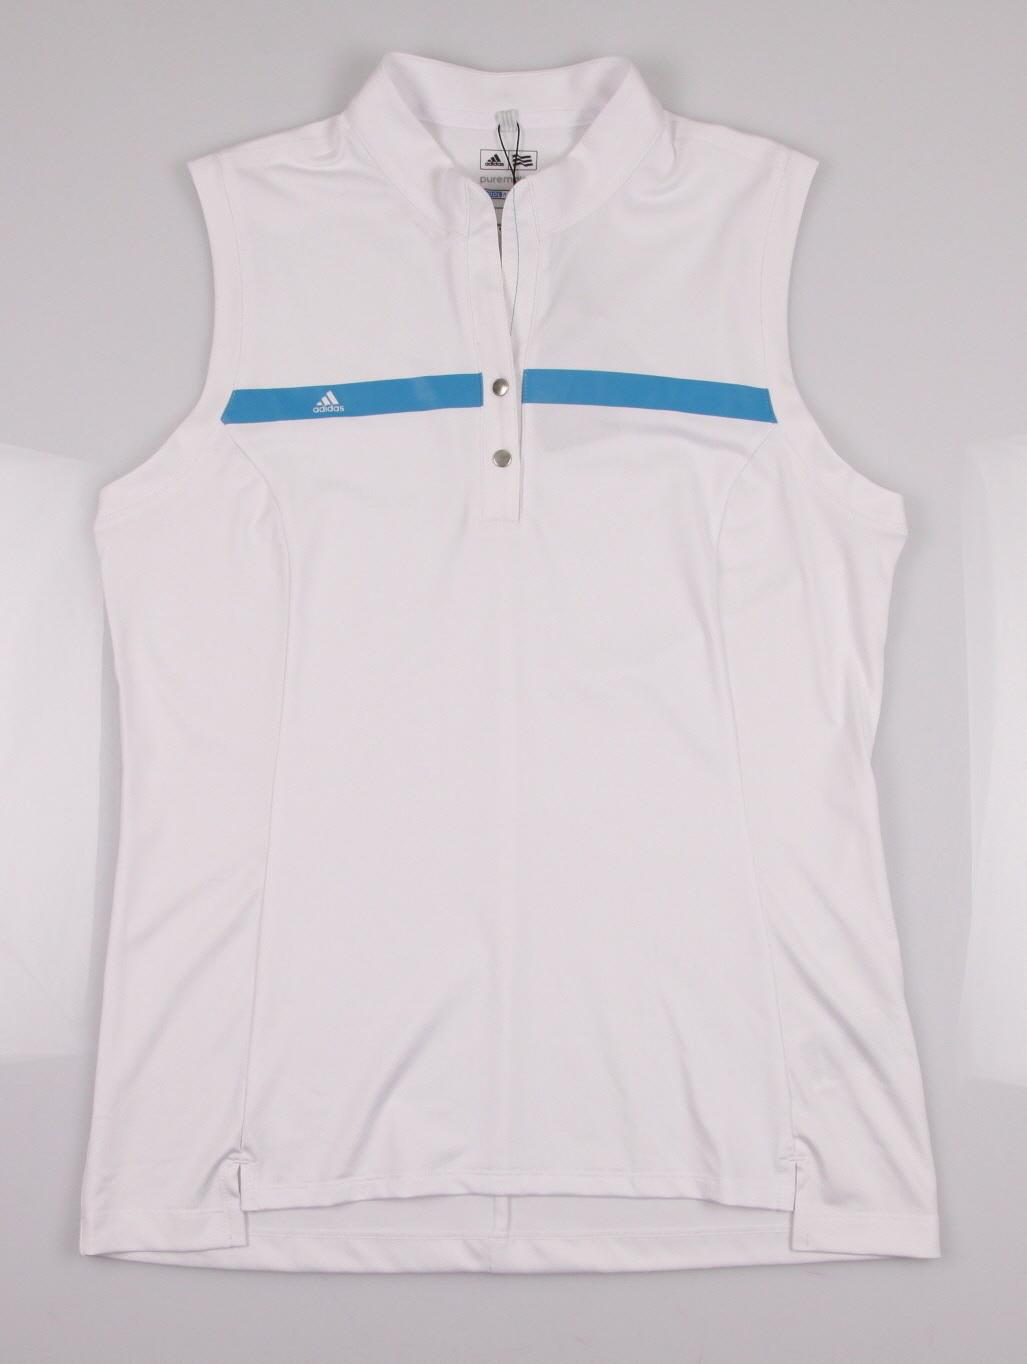 New Adidas Women 39 S Puremotion Sleeveless Mock Neck Golf